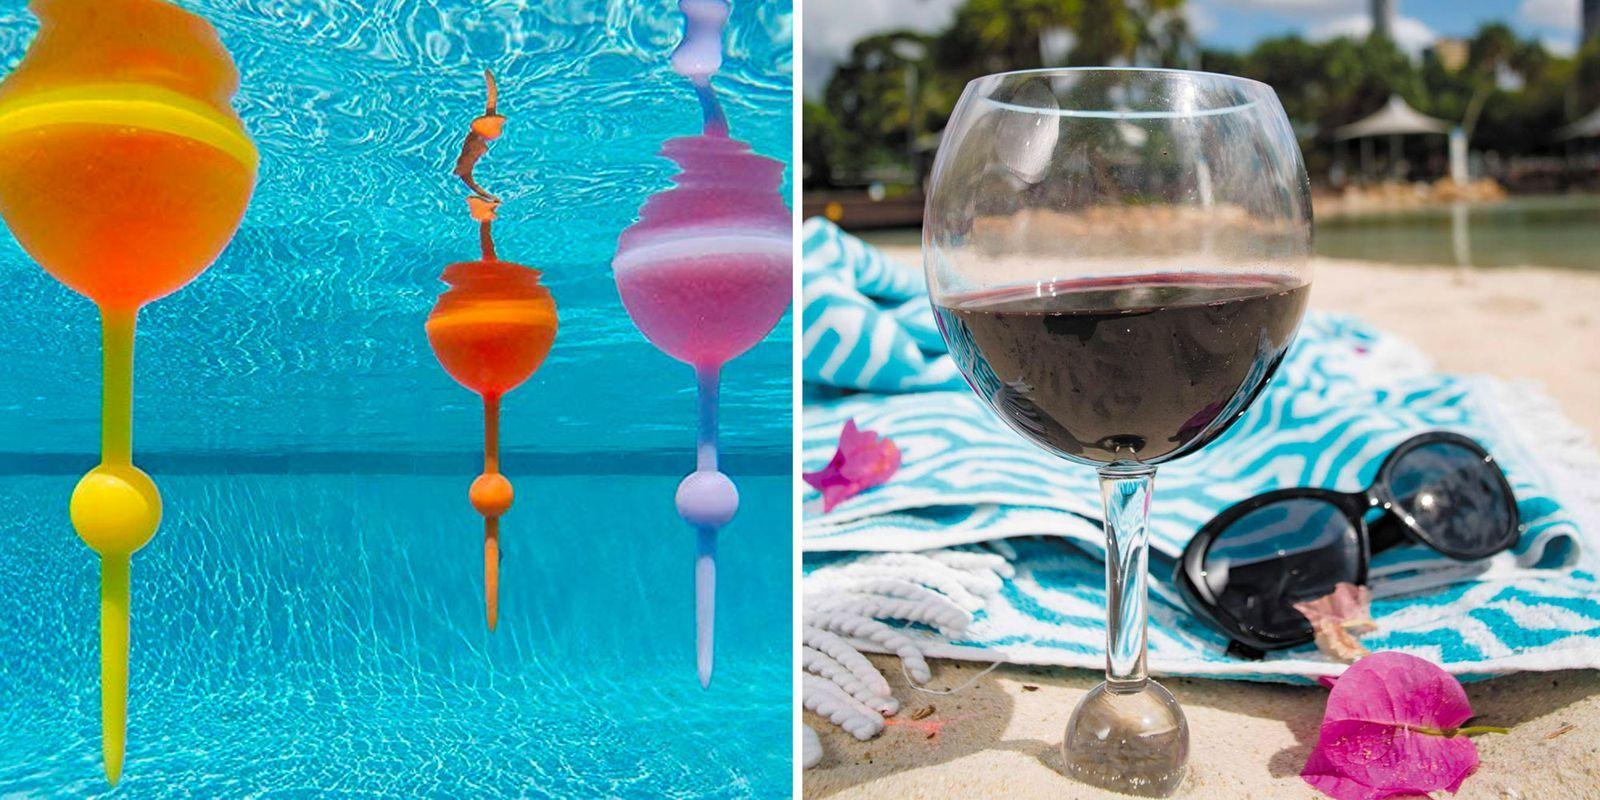 Wine Floats